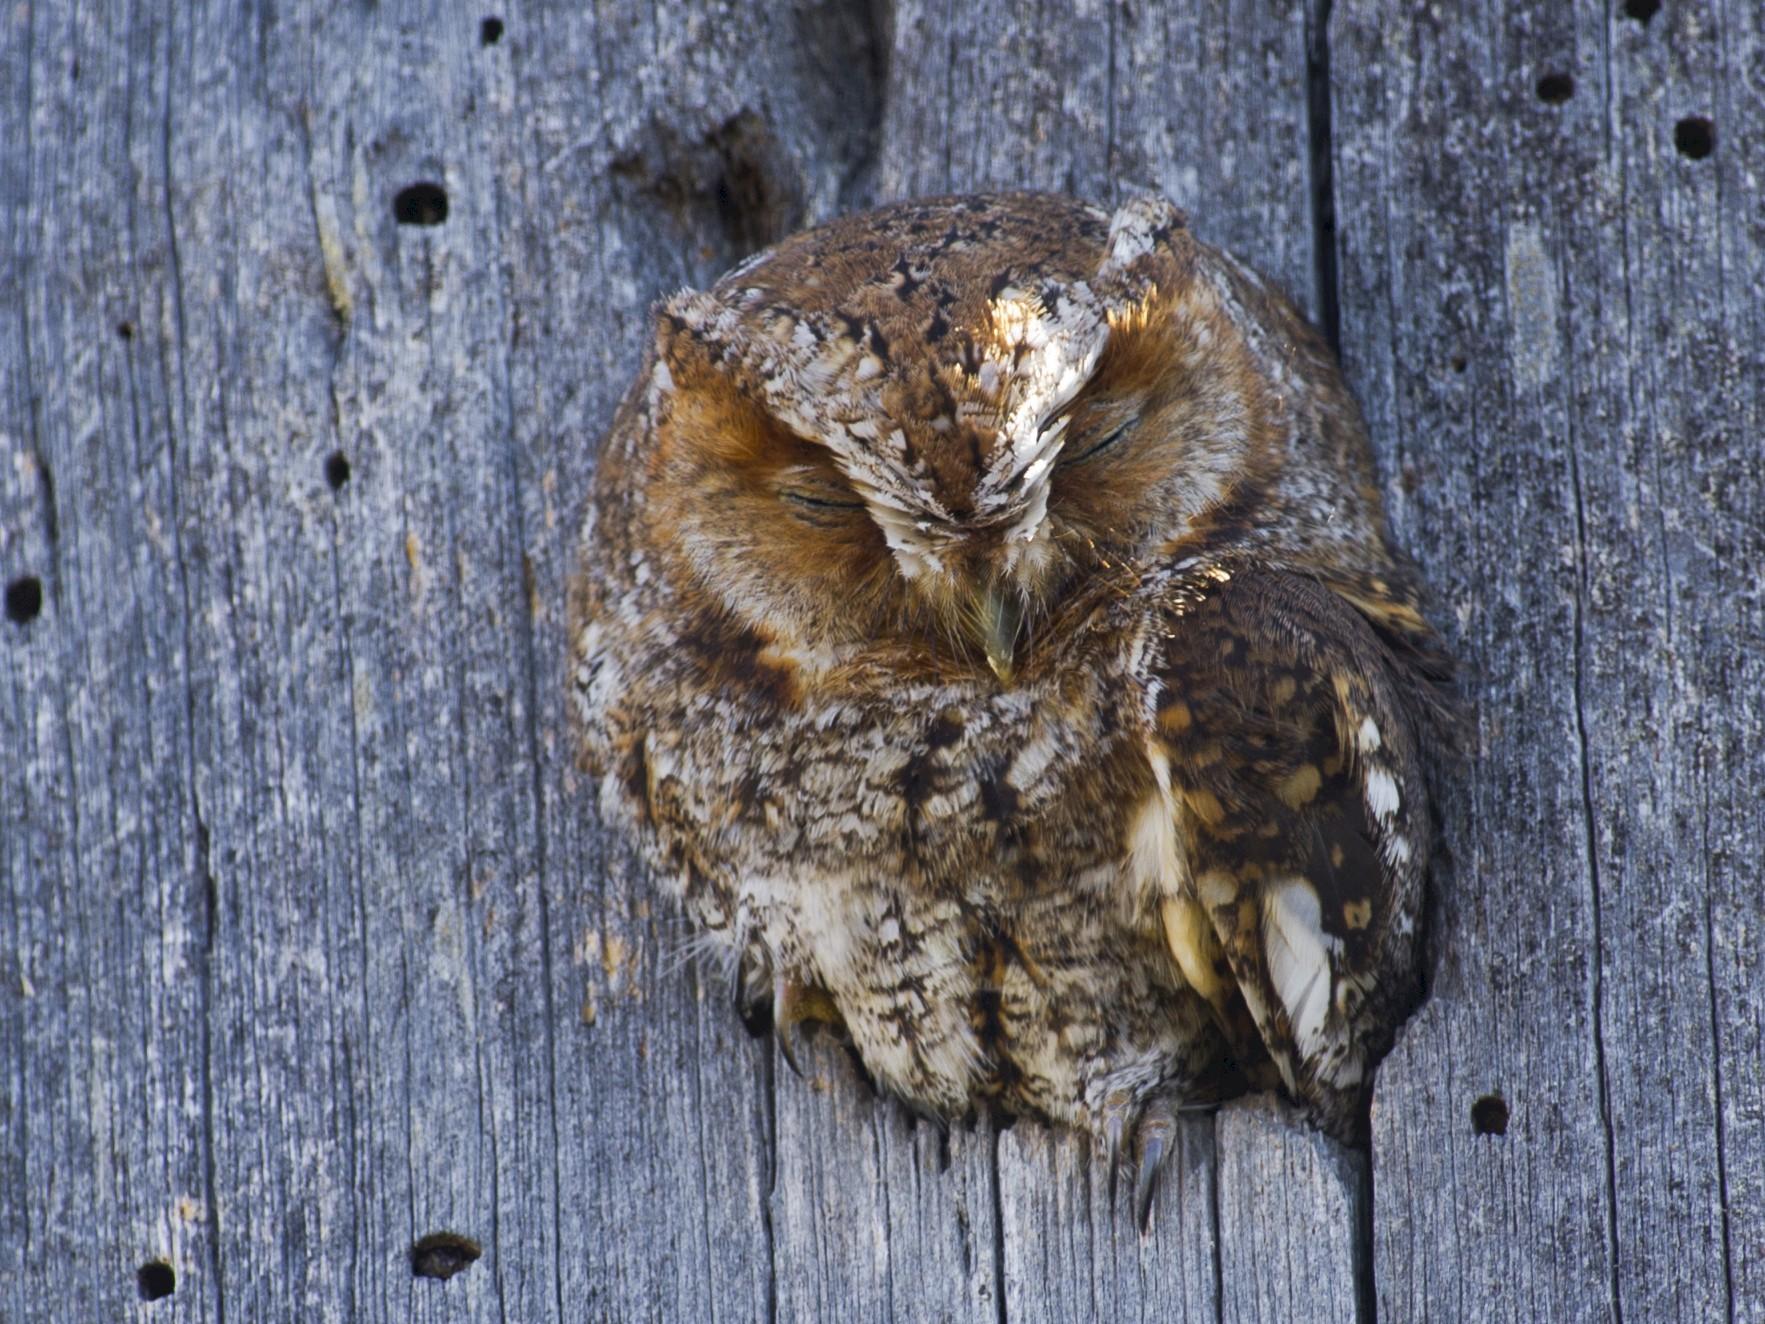 Flammulated Owl - John Cahill xikanel.com